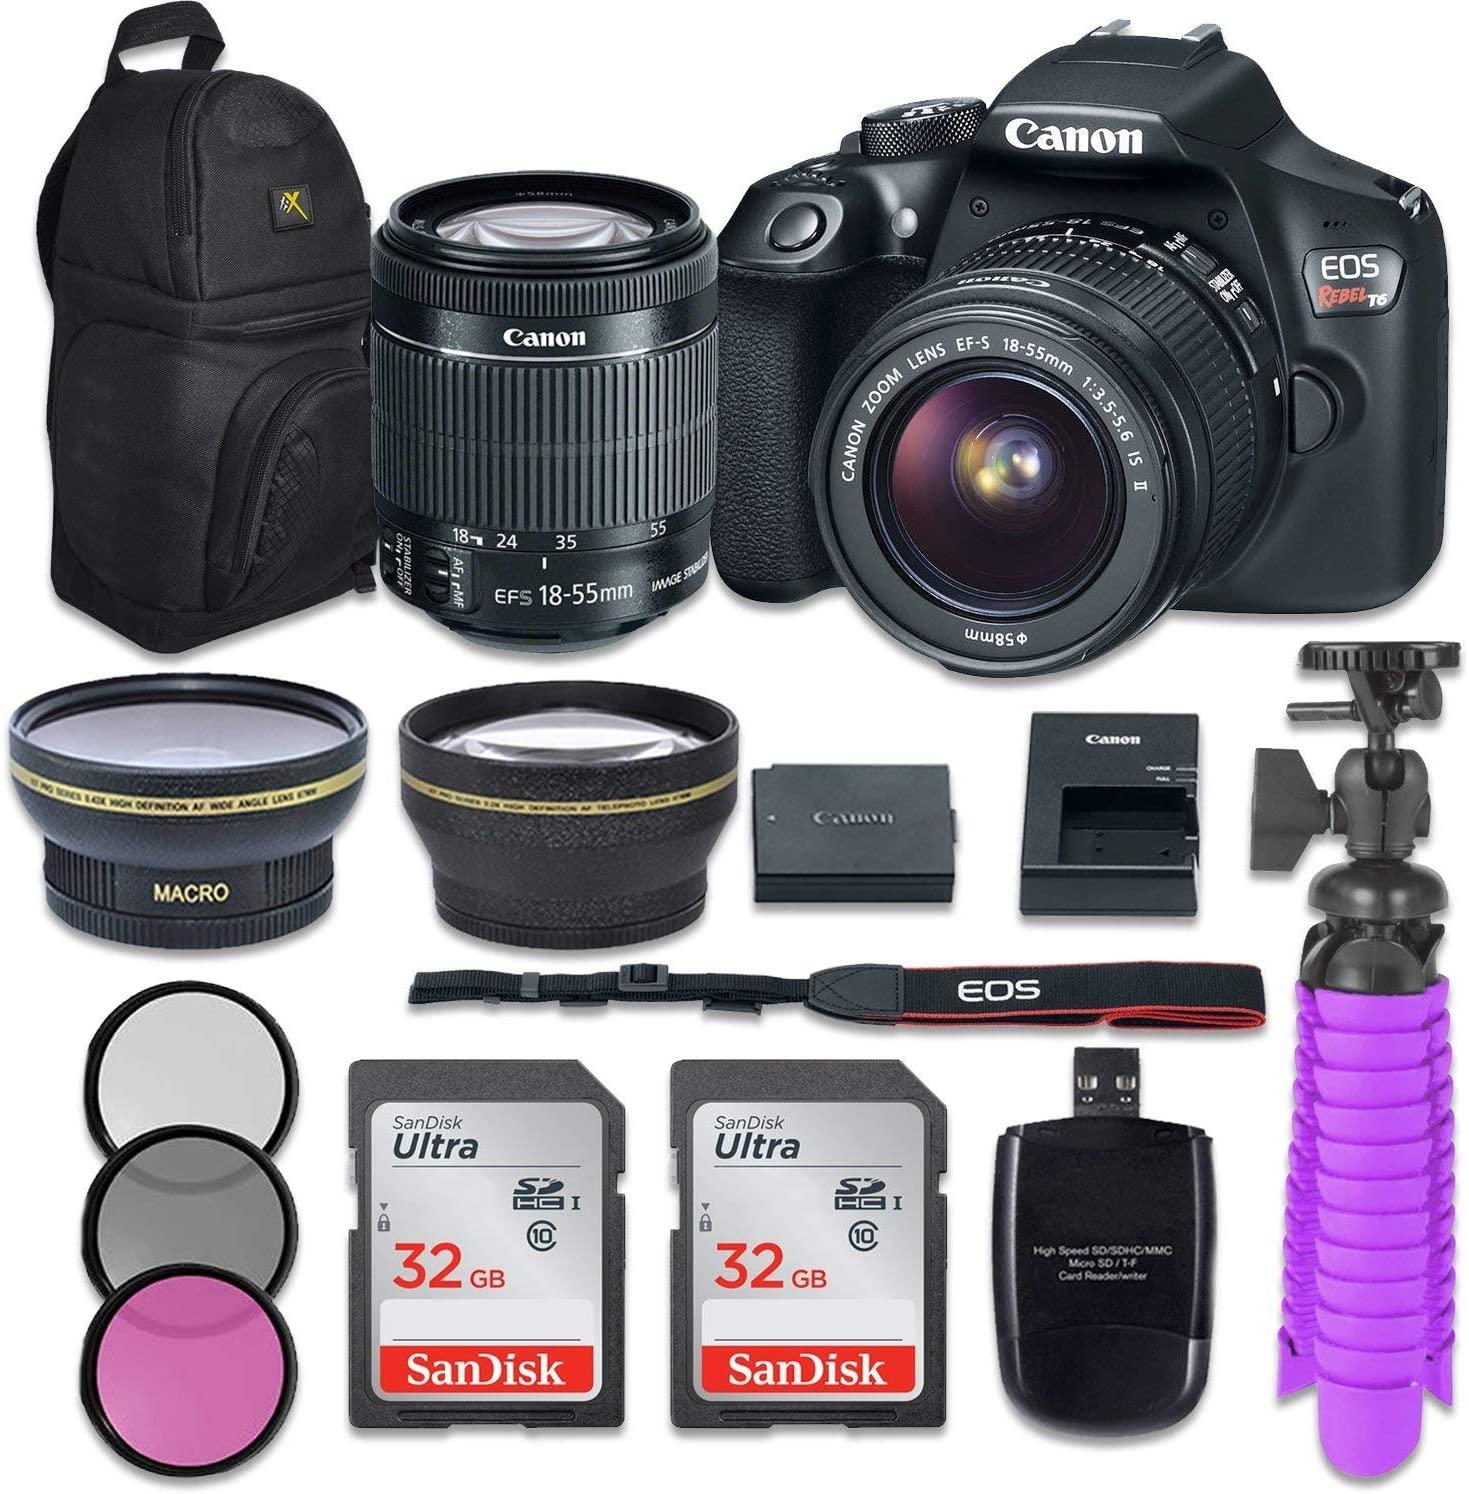 Canon EOS Rebel T6 Digital SLR Camera with EF-S 18-55mm is II Kit + Accessory Bundle (Renewed)